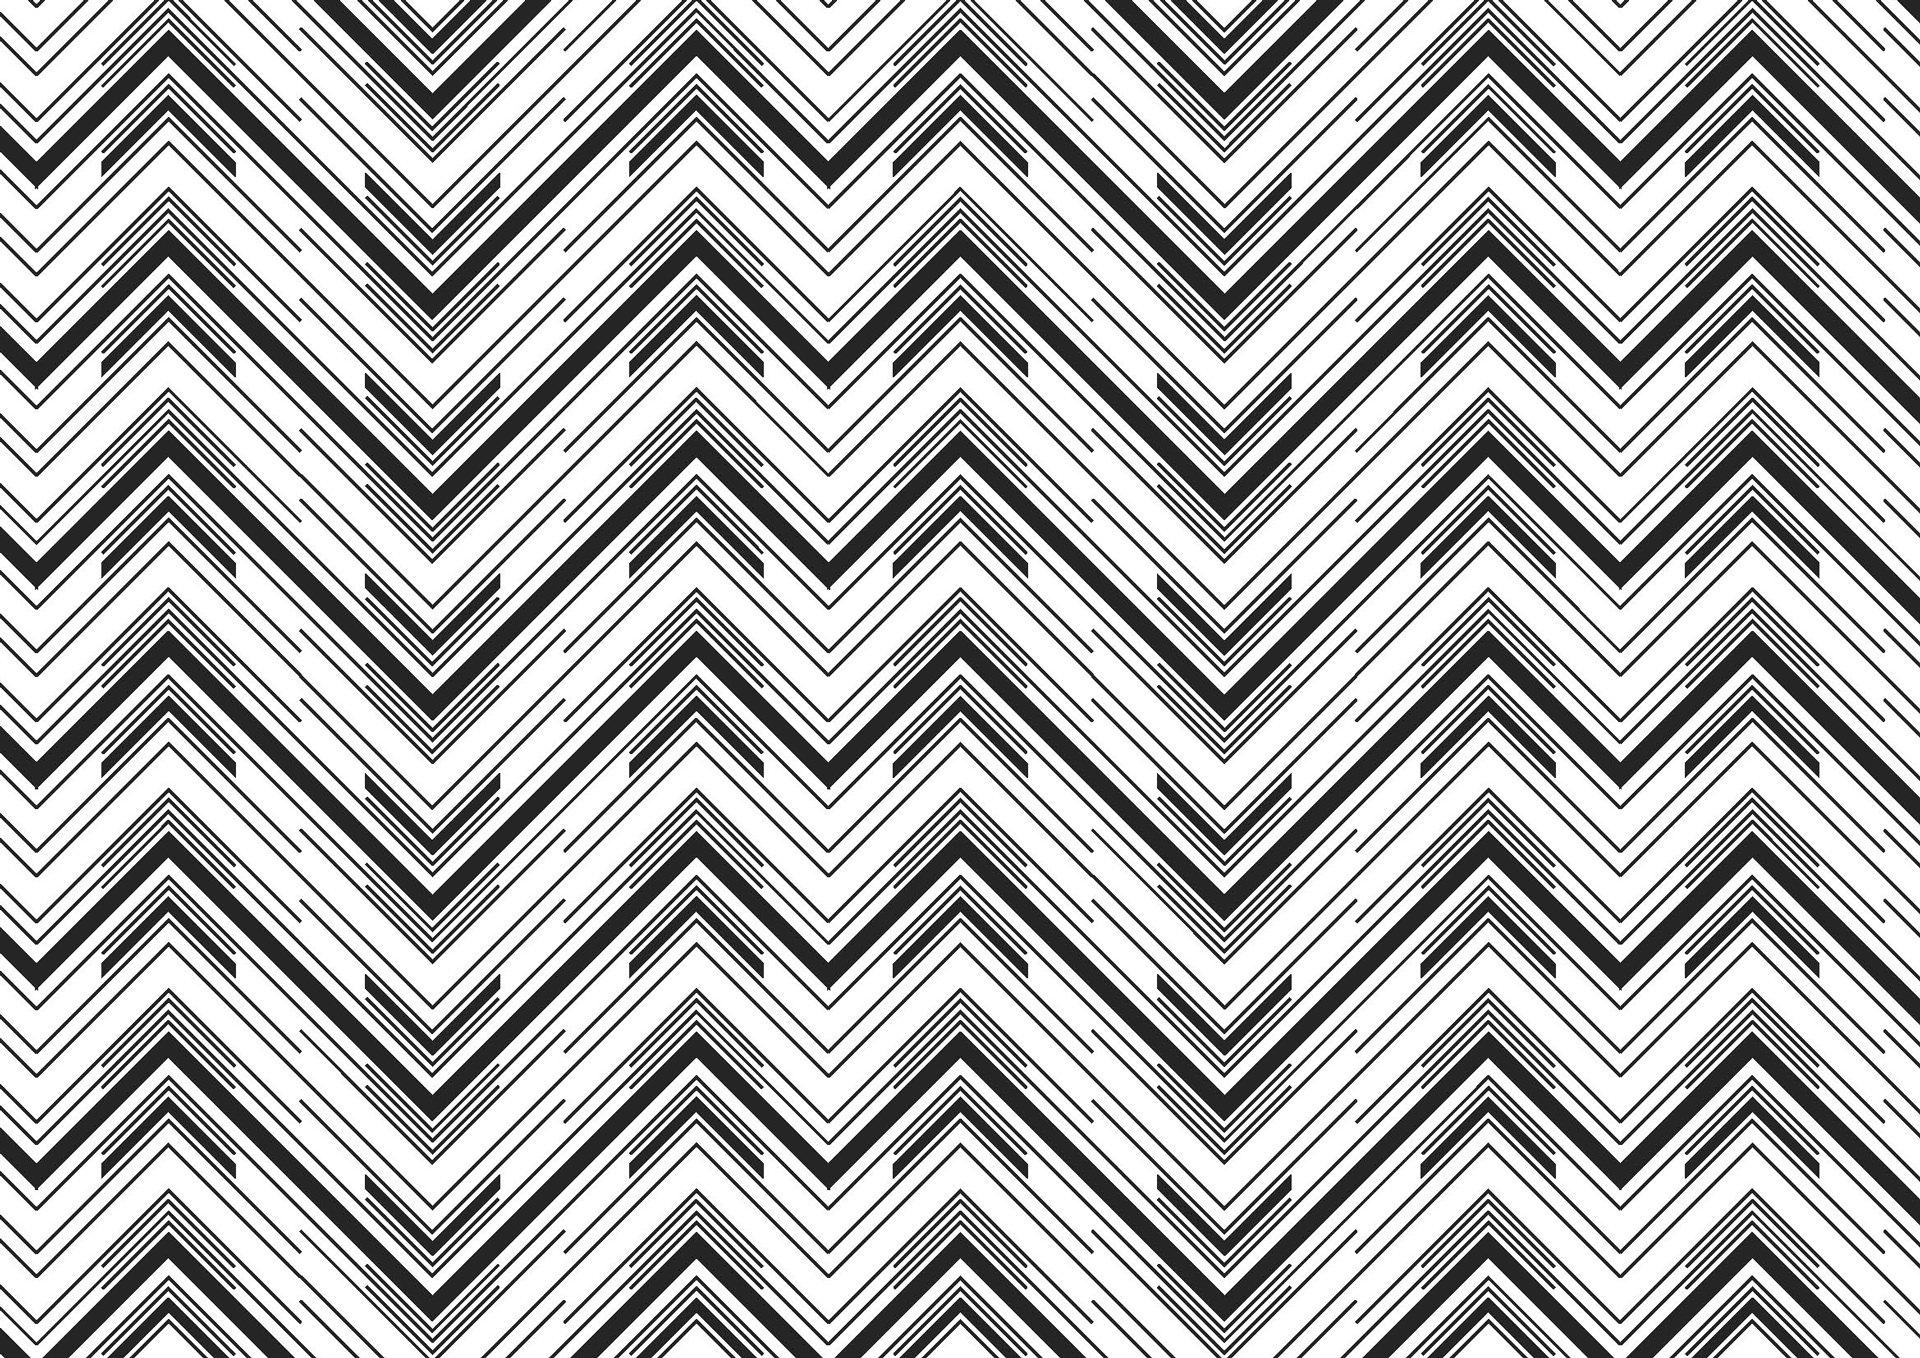 pattern_03